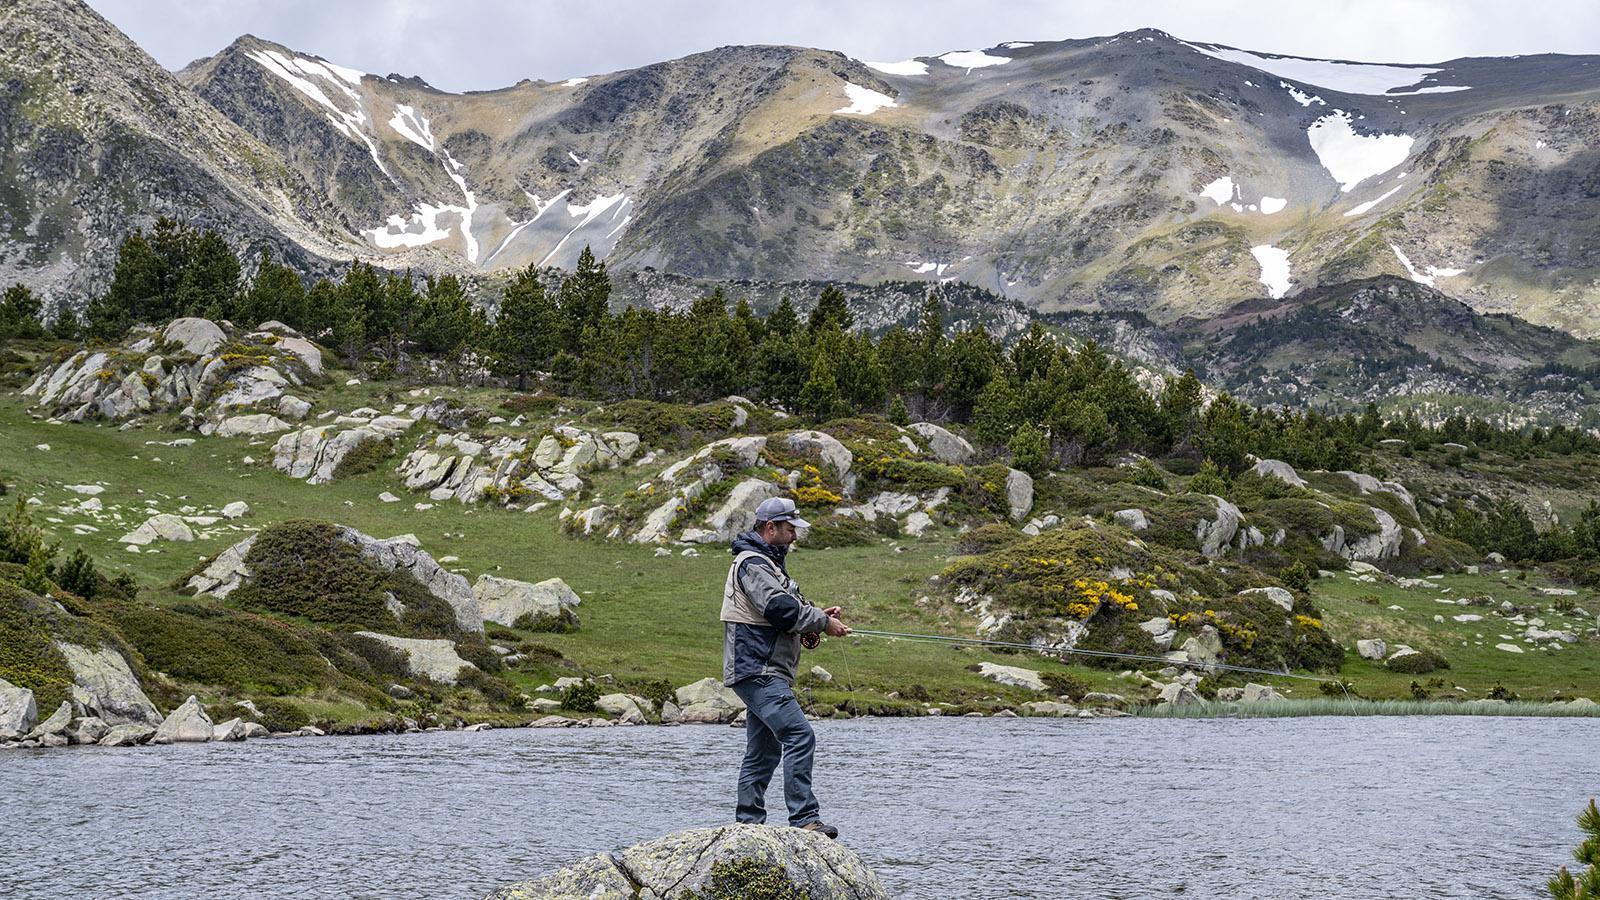 Julian Rouge beim Fliegenfischen am Estany Llat. Foto: Hilke Maunder